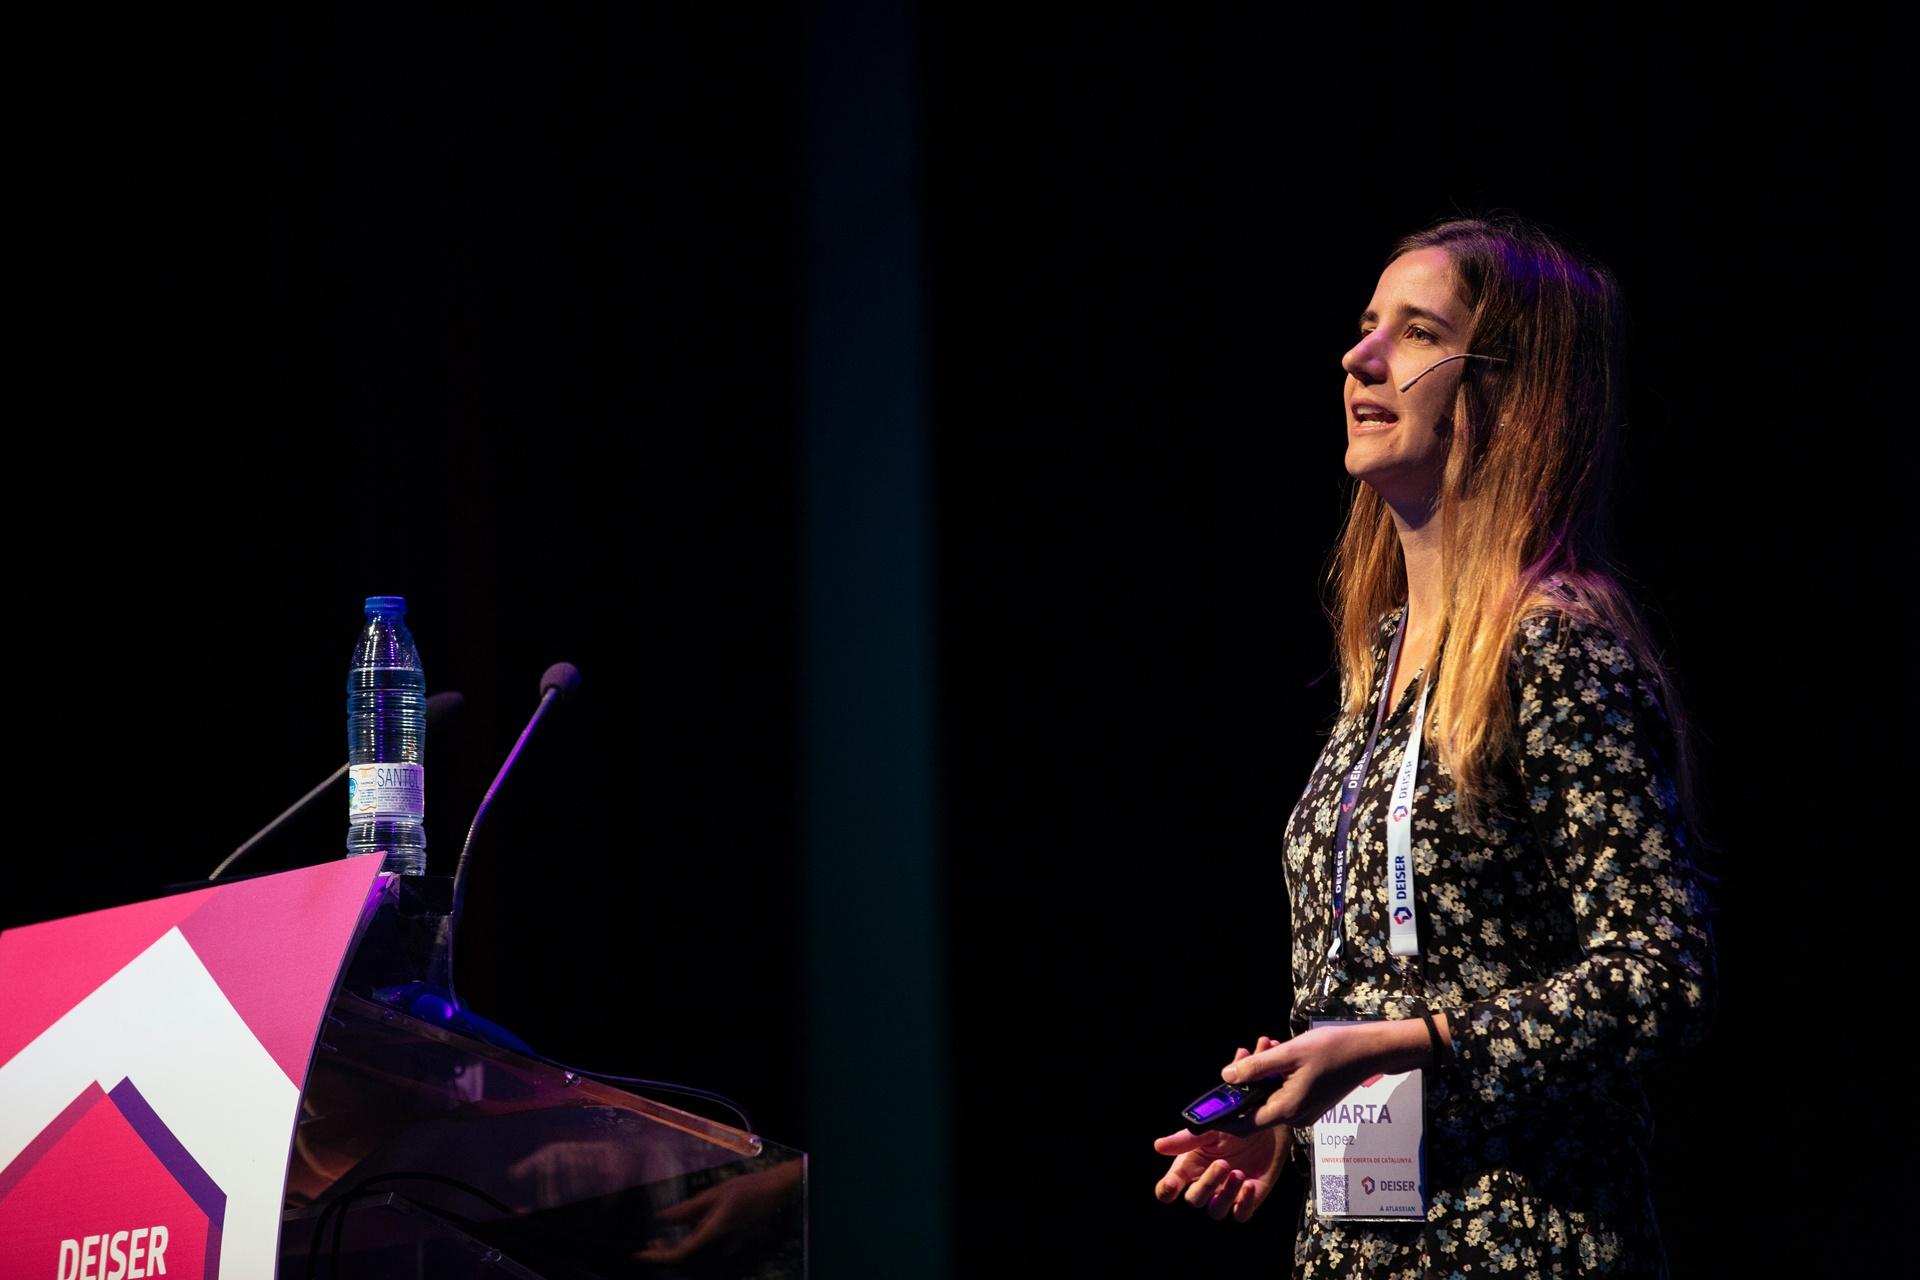 DEISER Enterprise Day Madrid 2017 | Marta López Reyes de la Universidad Abierta de Cataluña